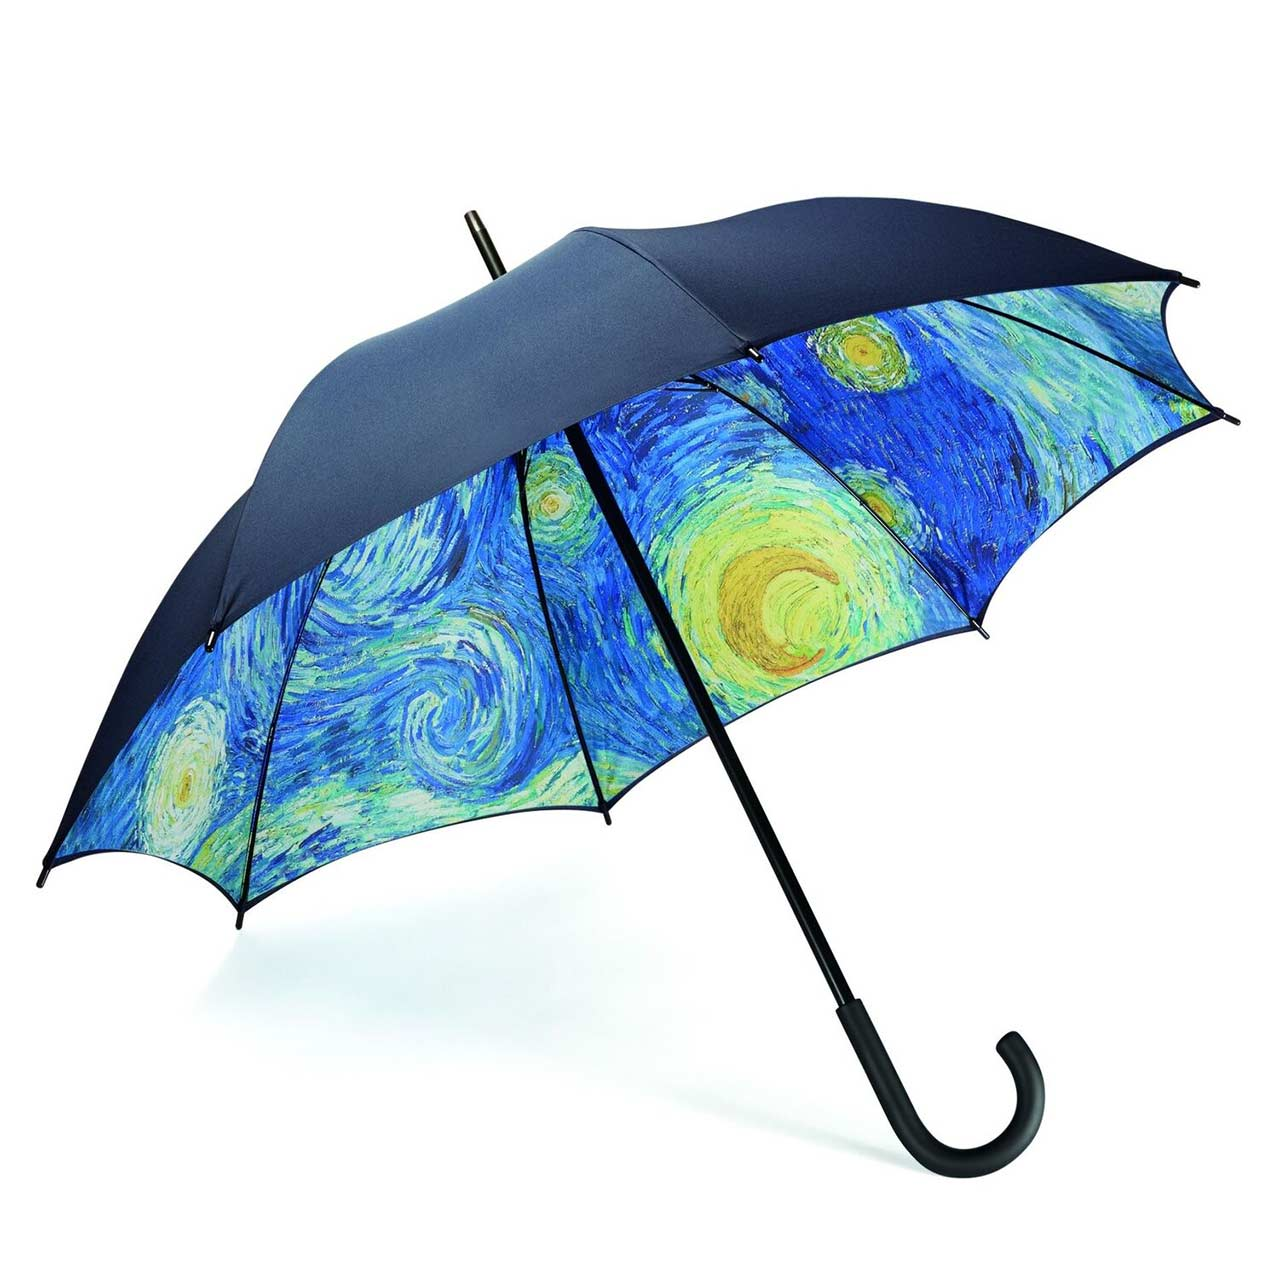 MoMa Starry Night Large Stick Umbrella | the design gift shop